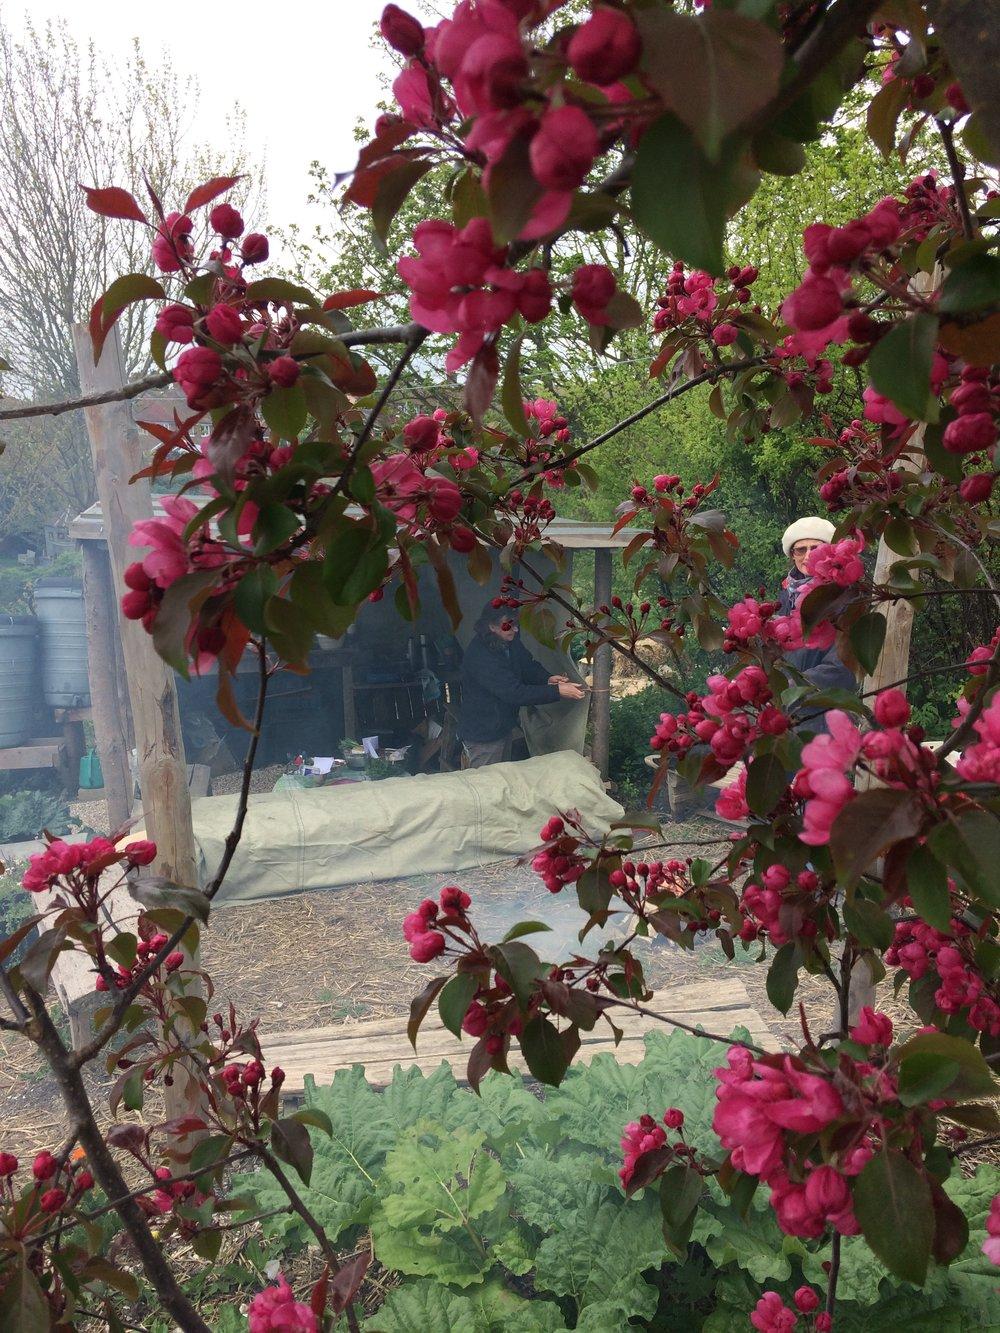 chloe edwards fire and feast lca blossom apr 2017.JPG